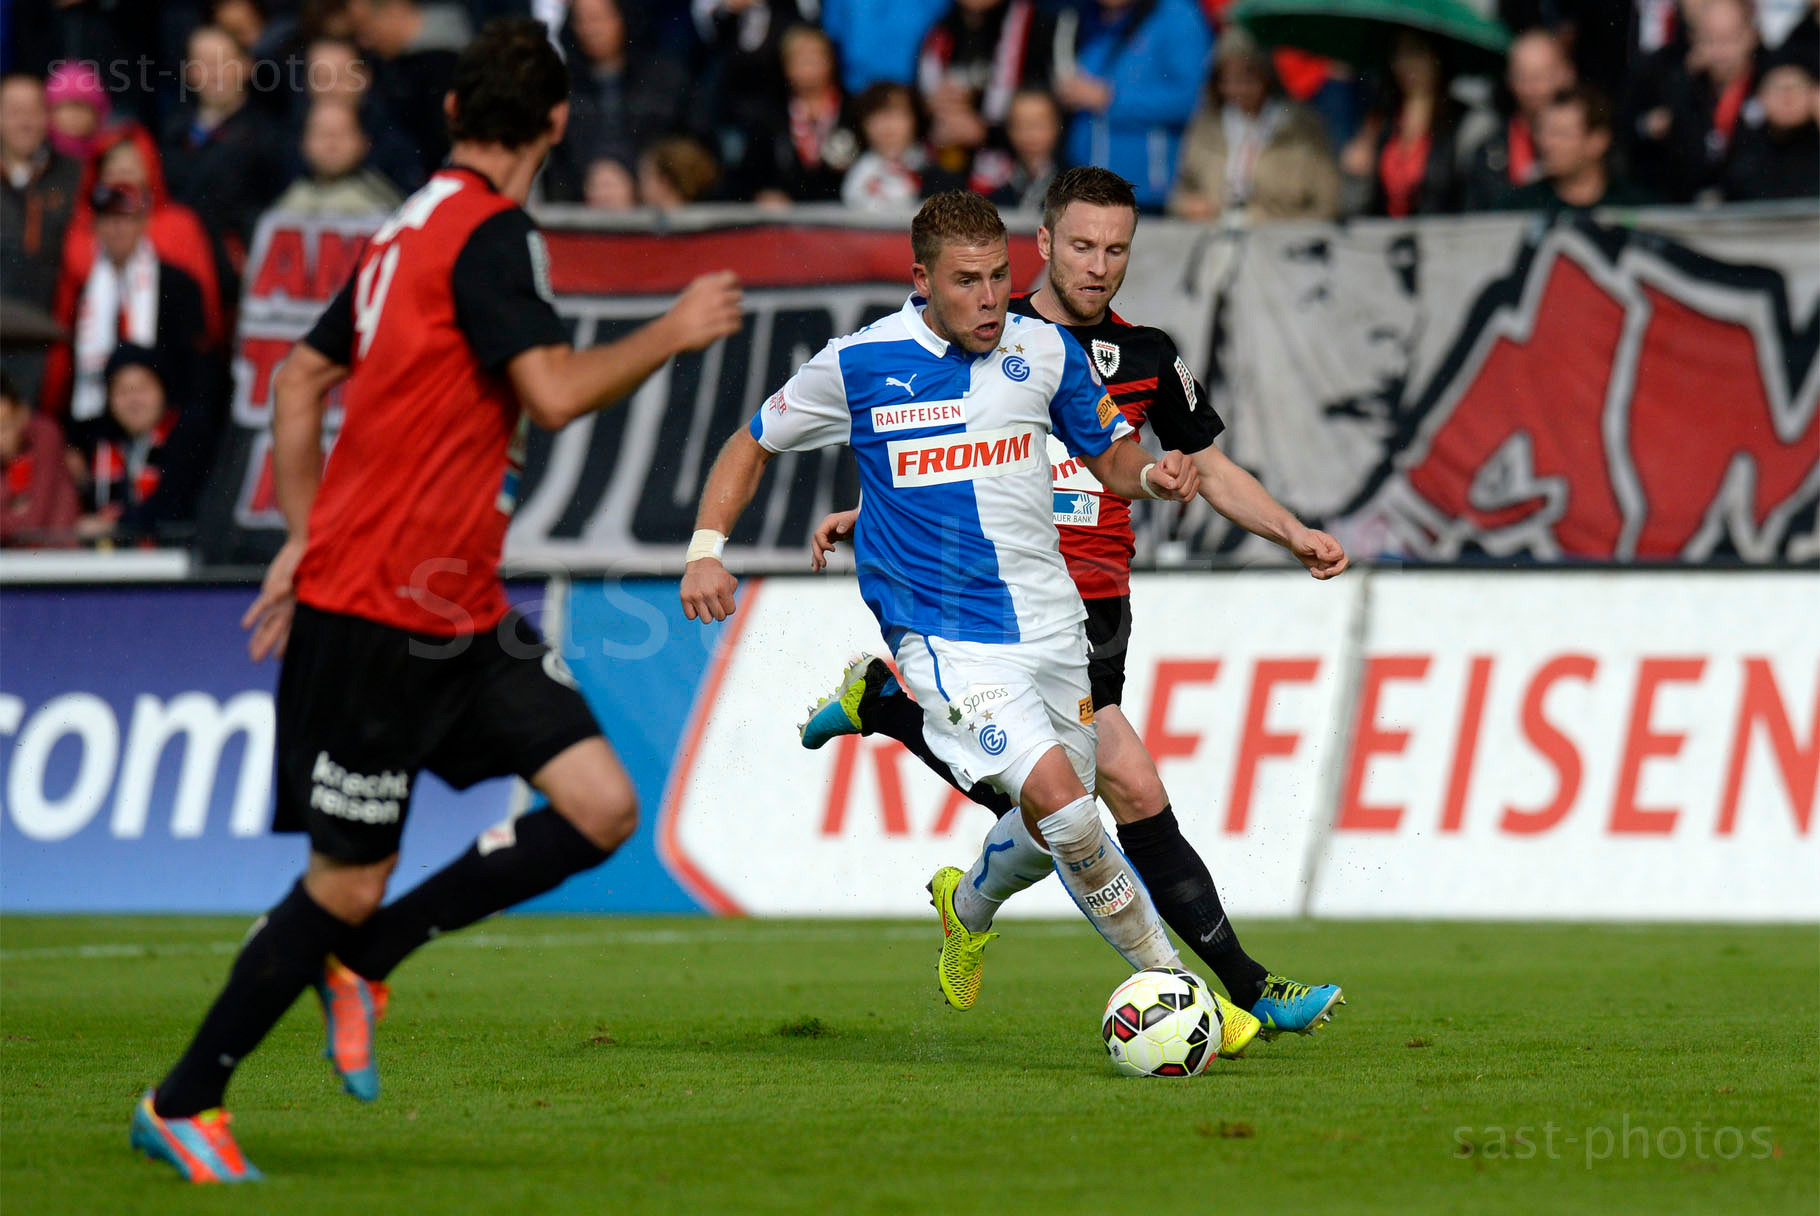 Yoric Ravet (GCZ) gegen Juan Pablo Garat (L. Aarau) und Alain Schultz (Aarau)